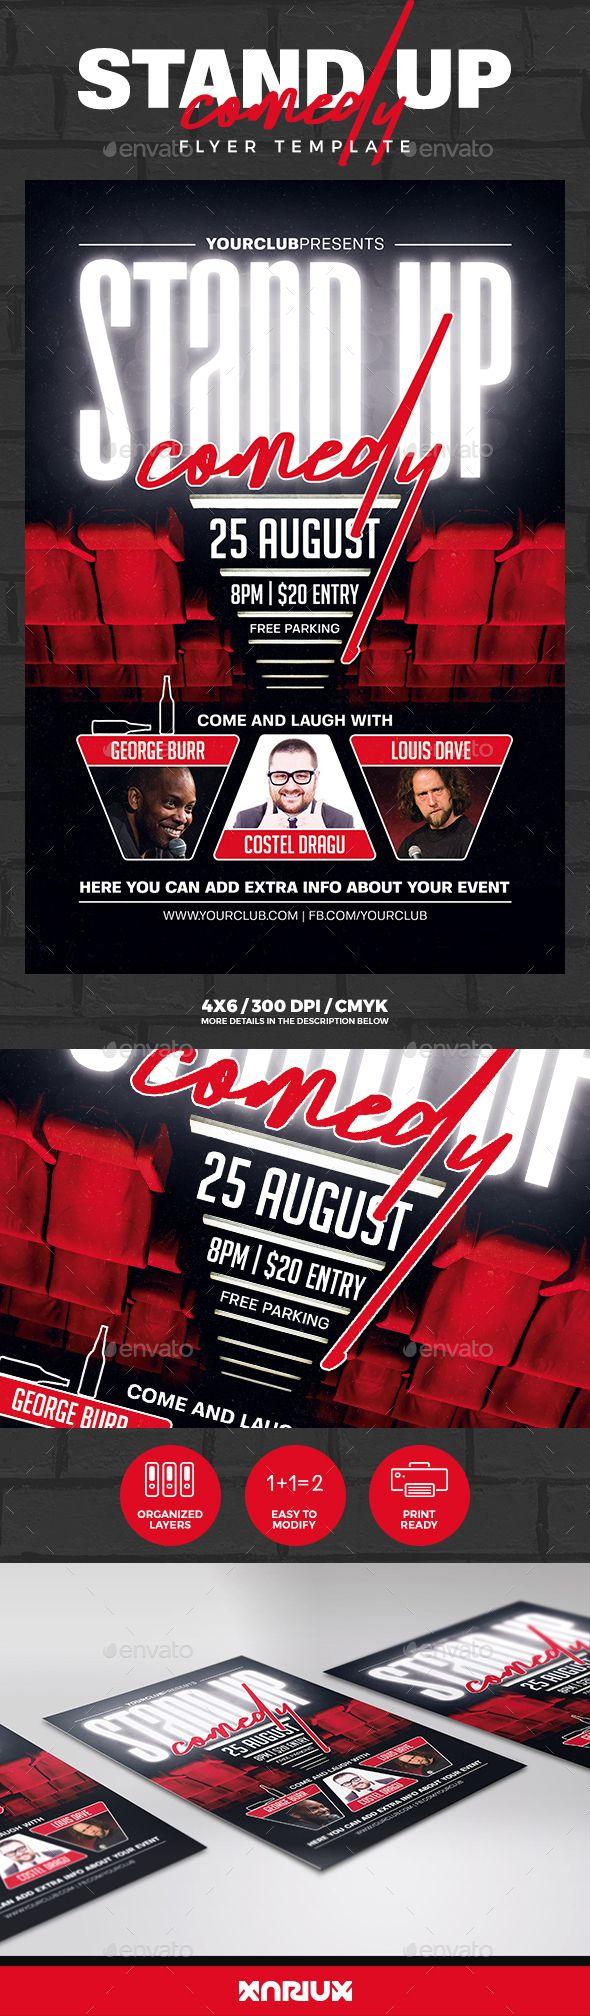 Comedy Flyer Template Download Erkalnathandedecker